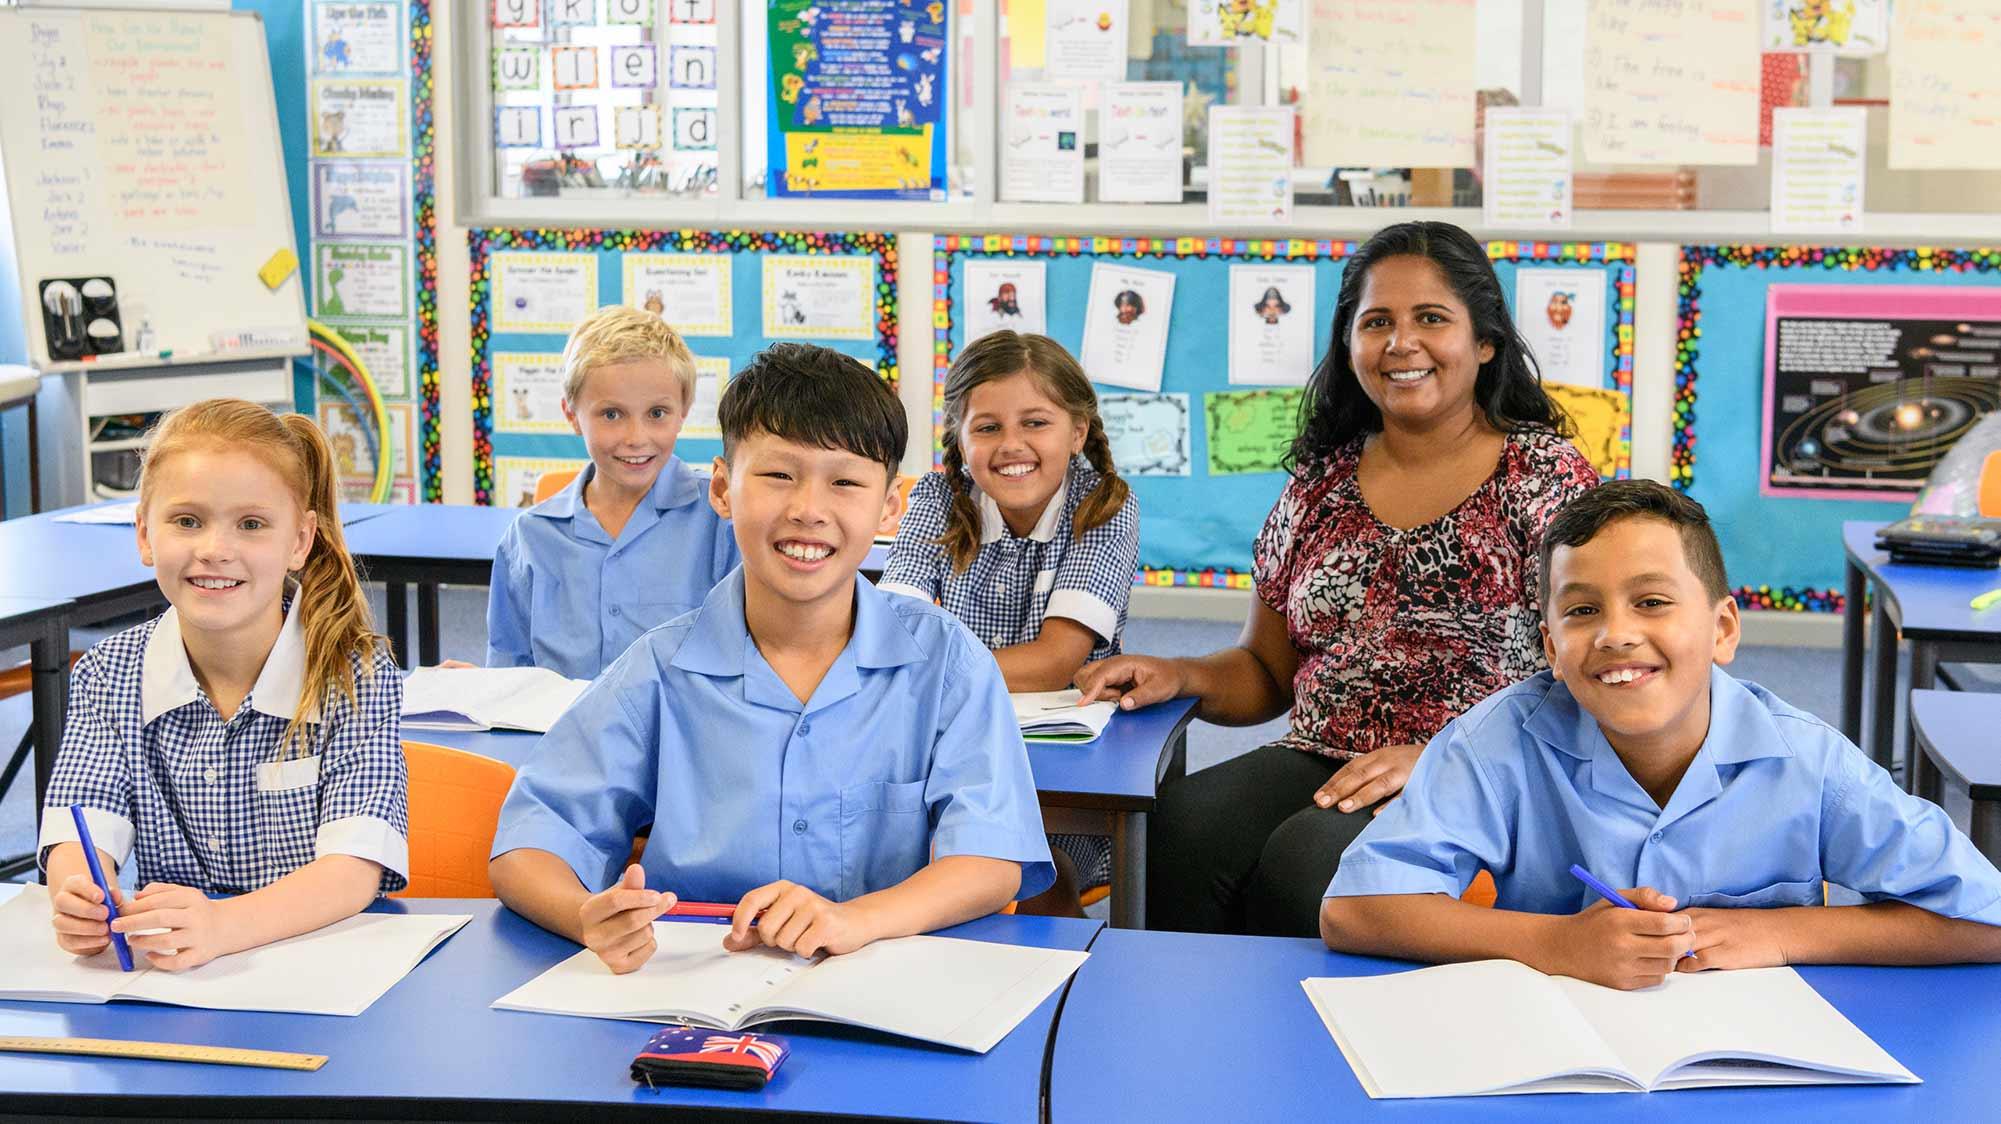 Teacher with five children in classroom